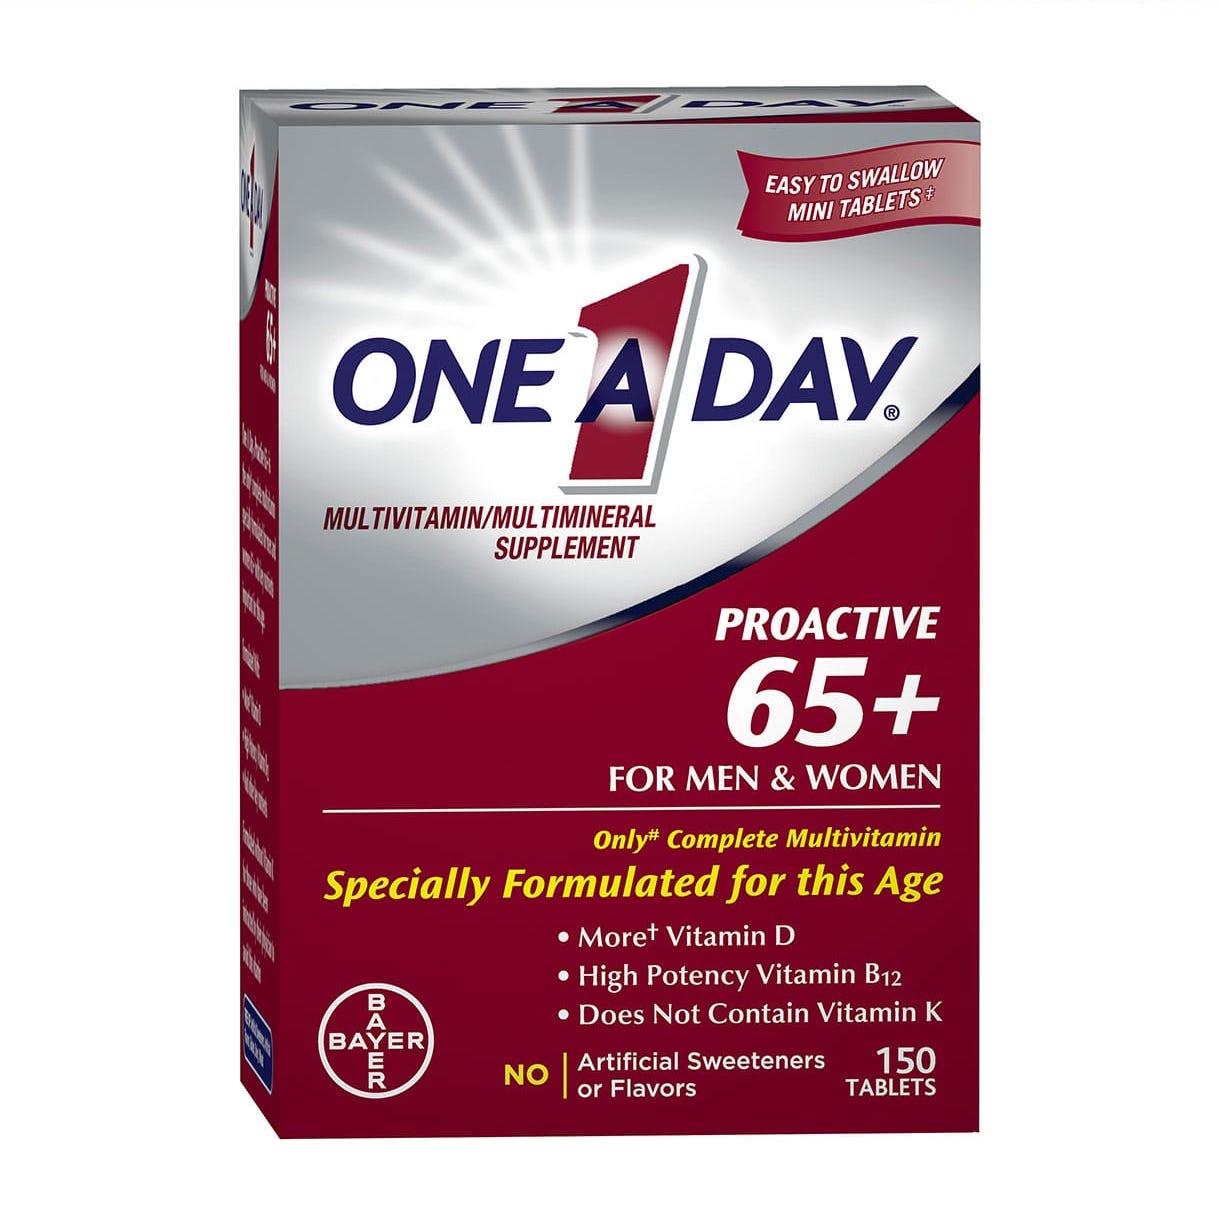 vien uong bo sung multivitamin one a day proactive 65 men women tren 65 tuoi